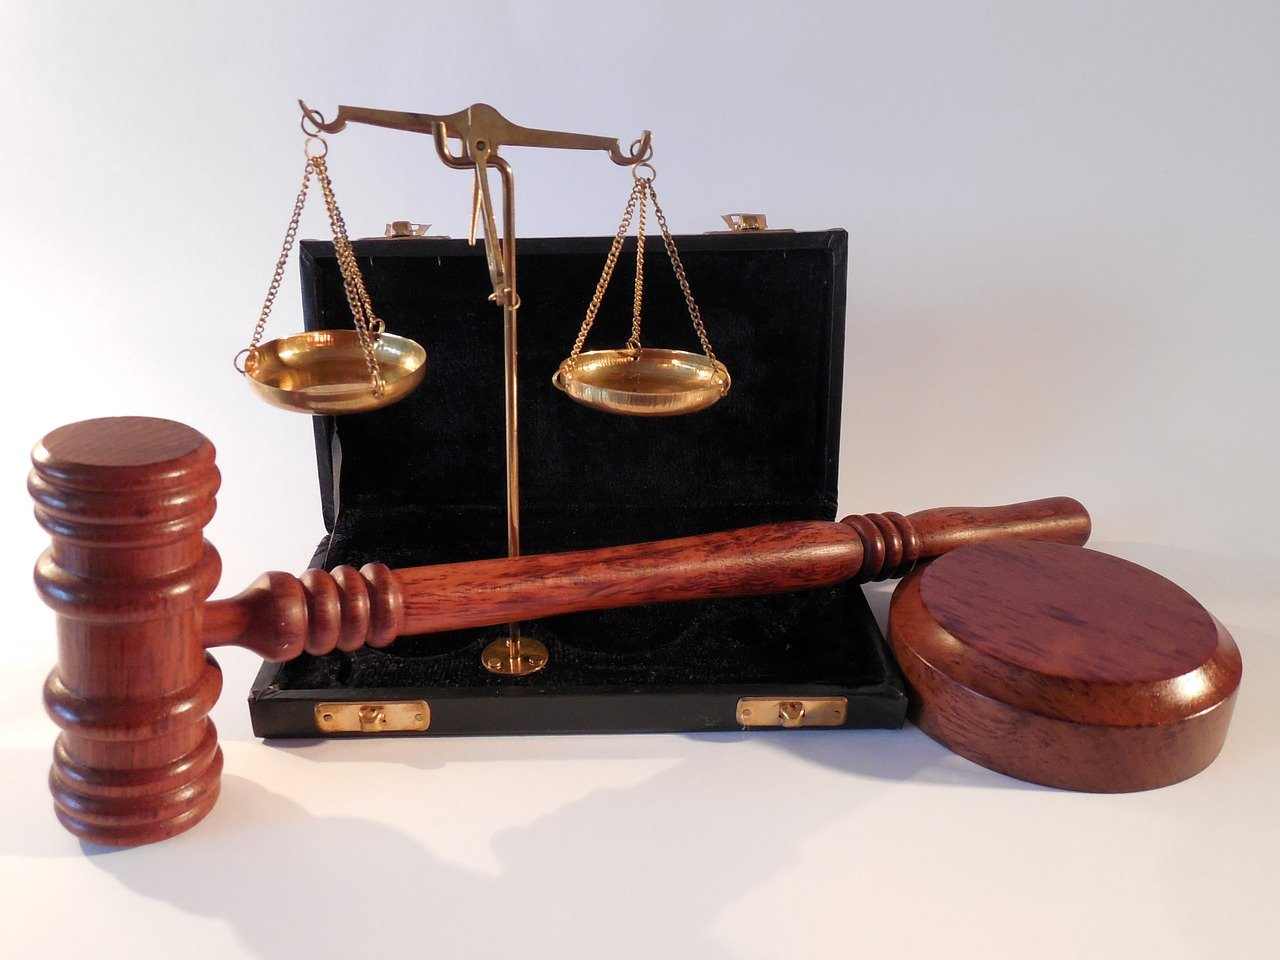 California Judicial Council adopts new rules during COVID-19 pandemic